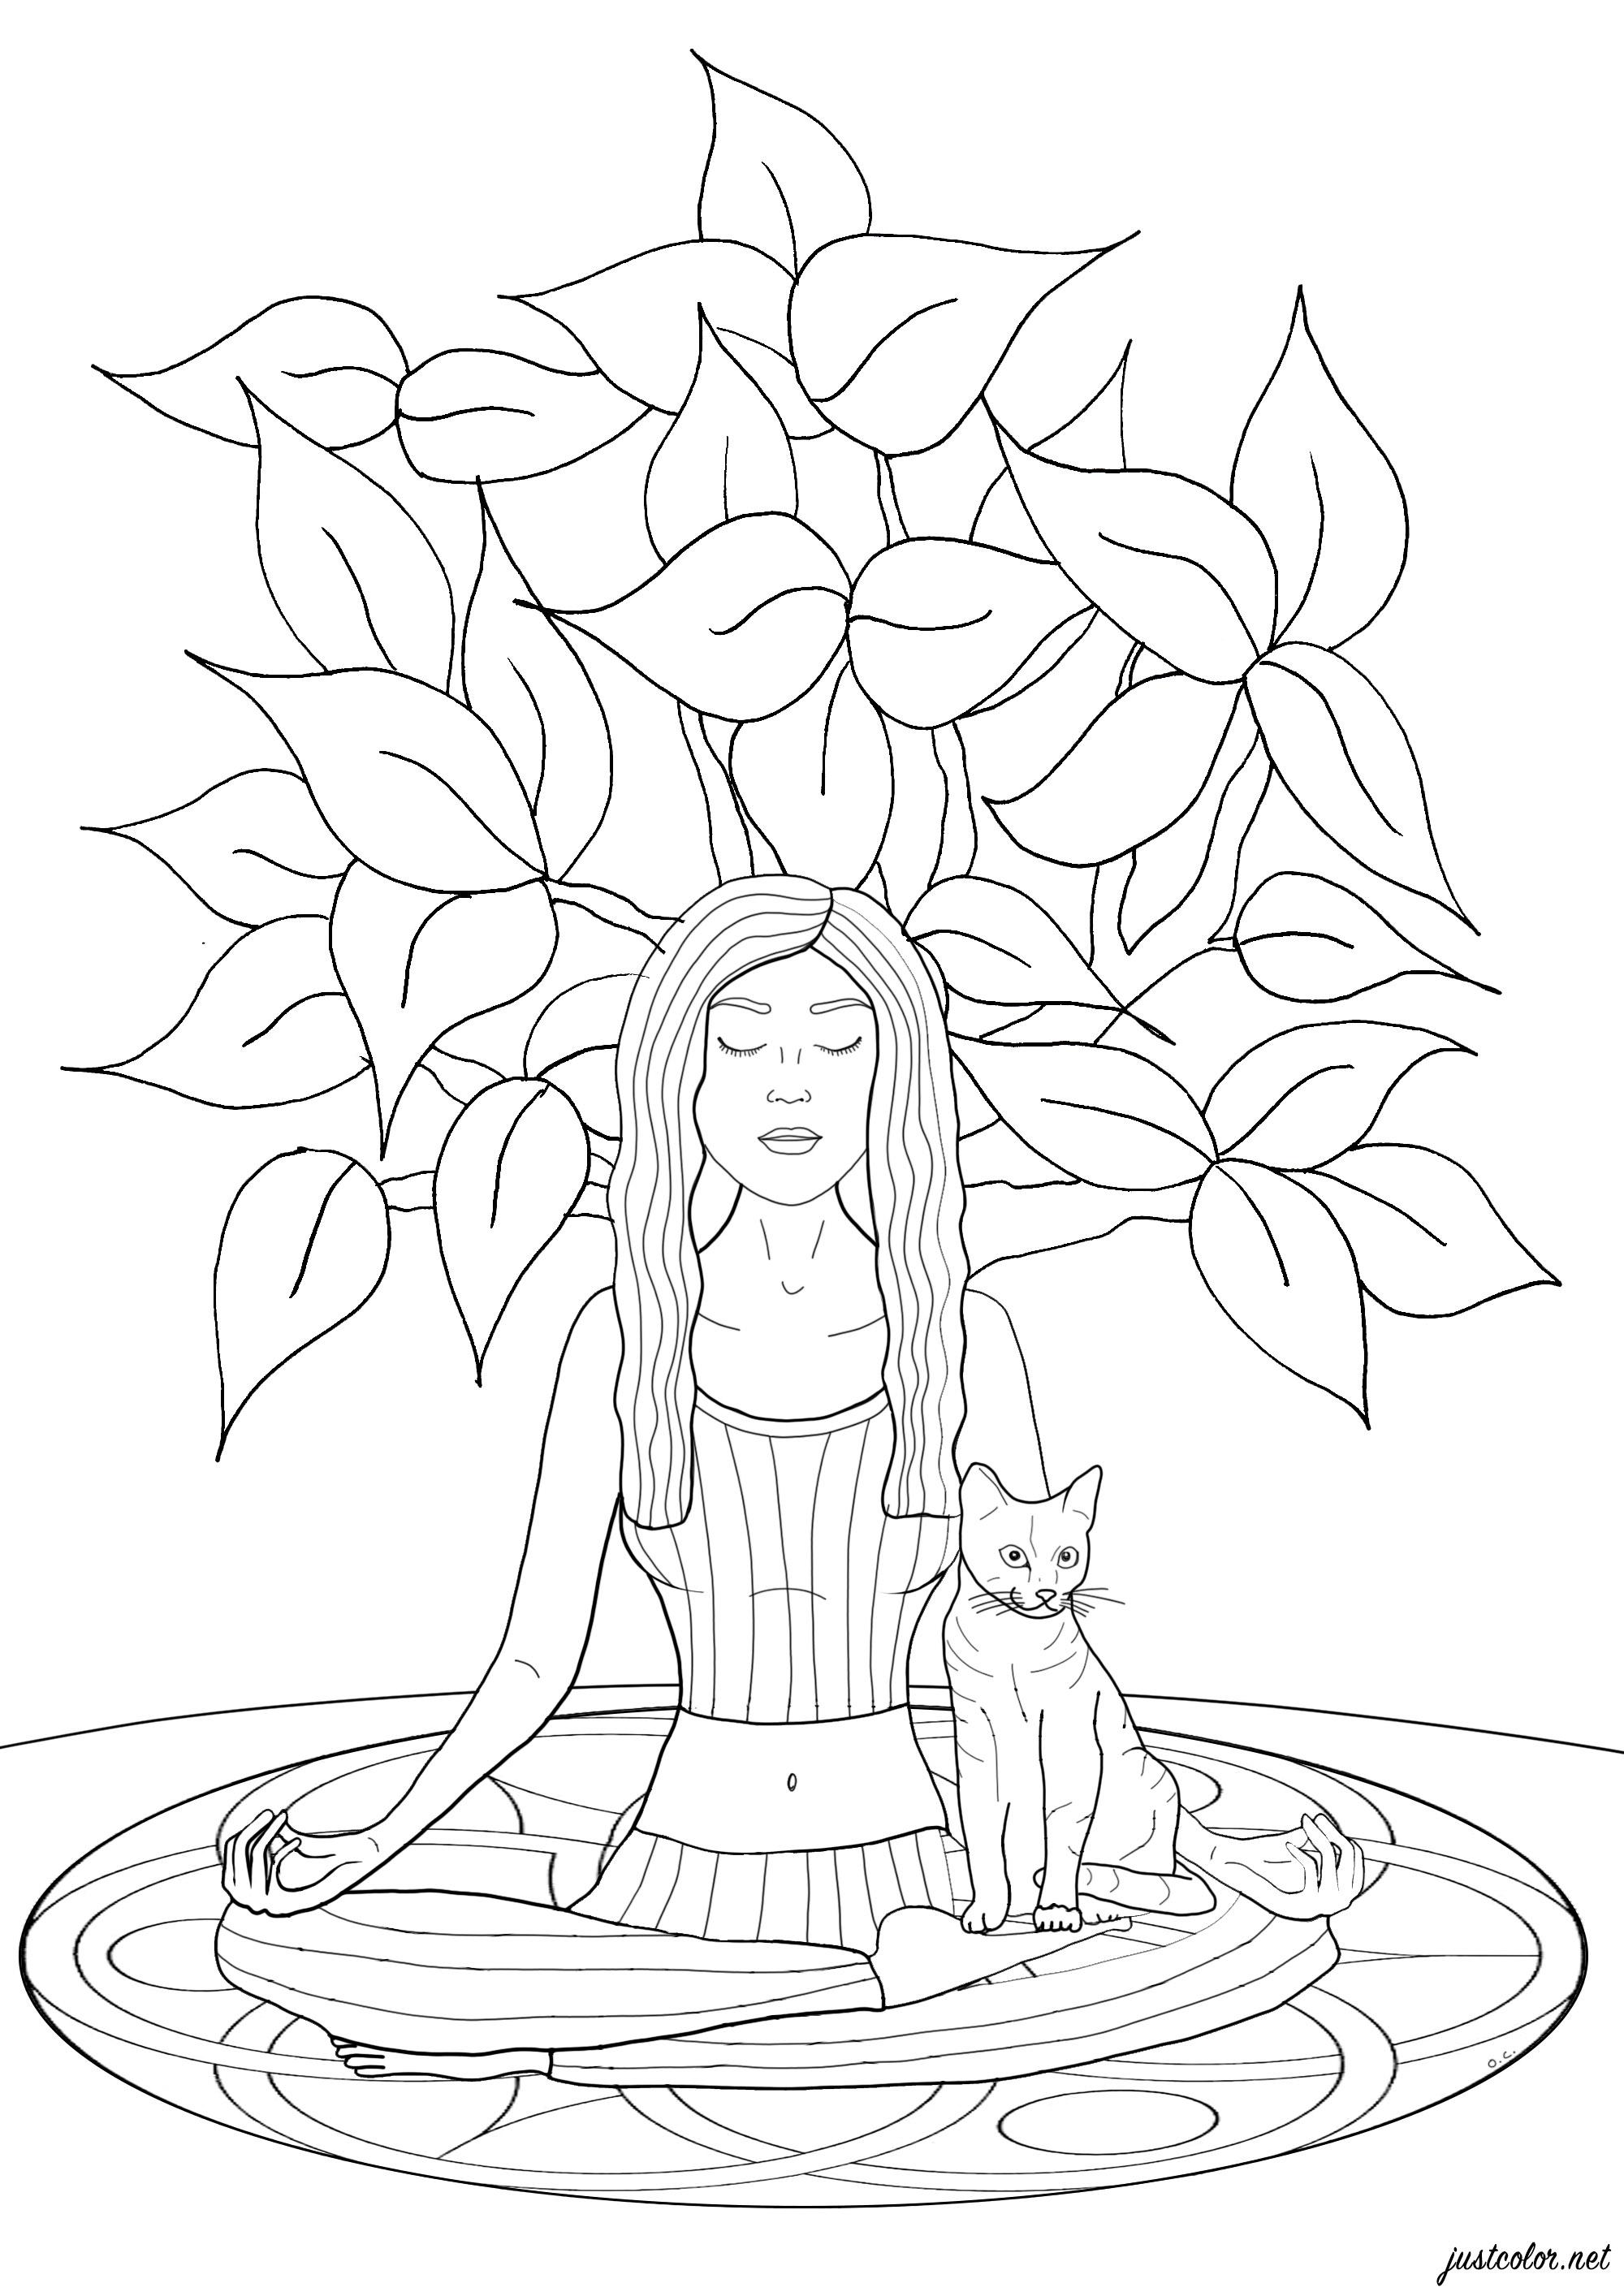 Malbuch Fur Erwachsene : Anti-stress / Zen - 1